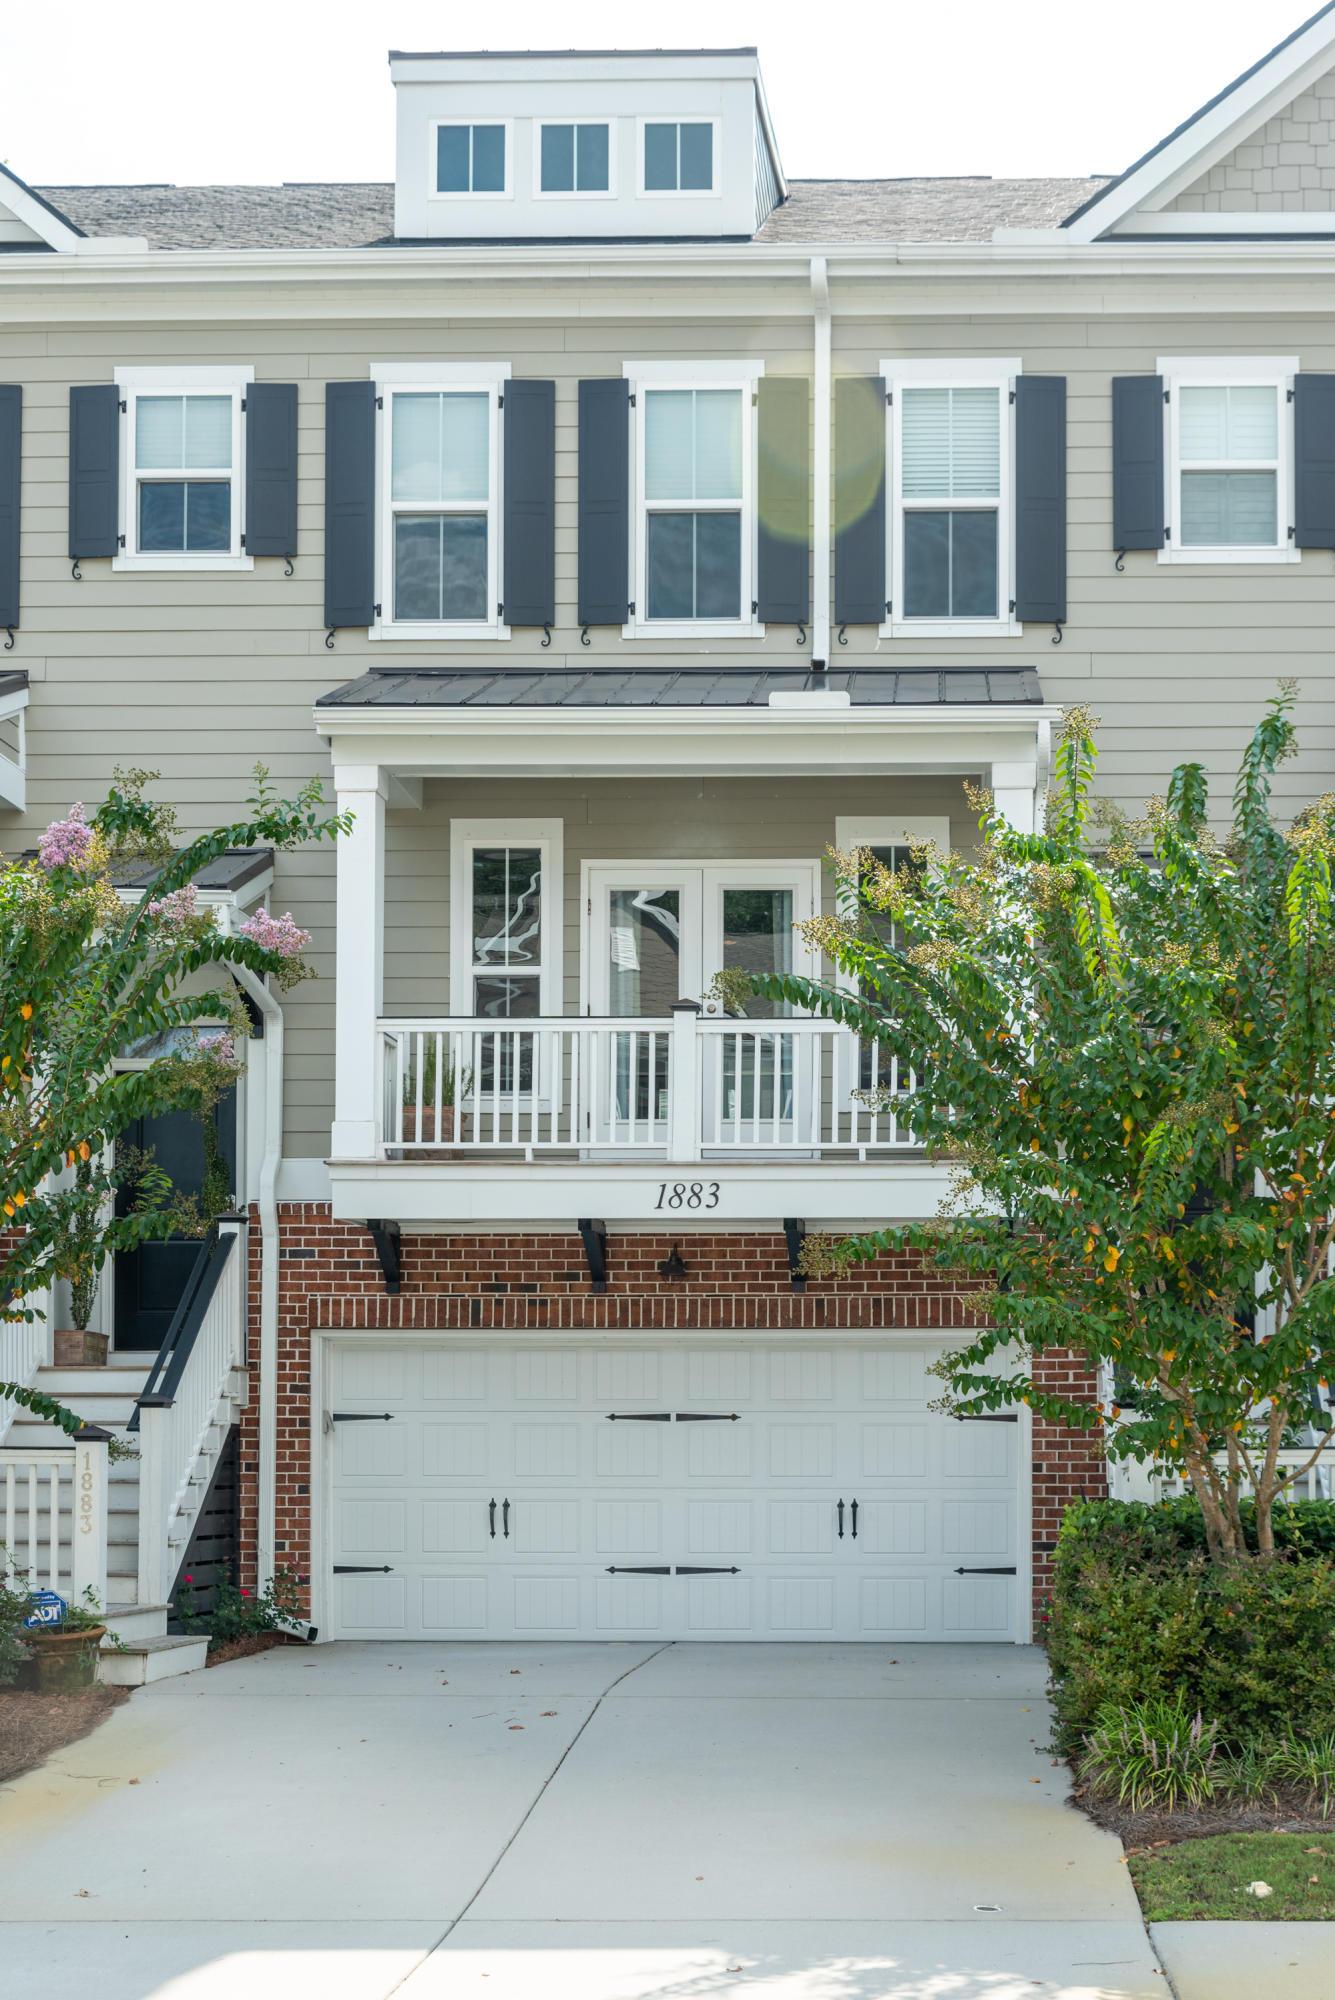 Carolina Walk Homes For Sale - 1883 Carolina Towne, Mount Pleasant, SC - 19